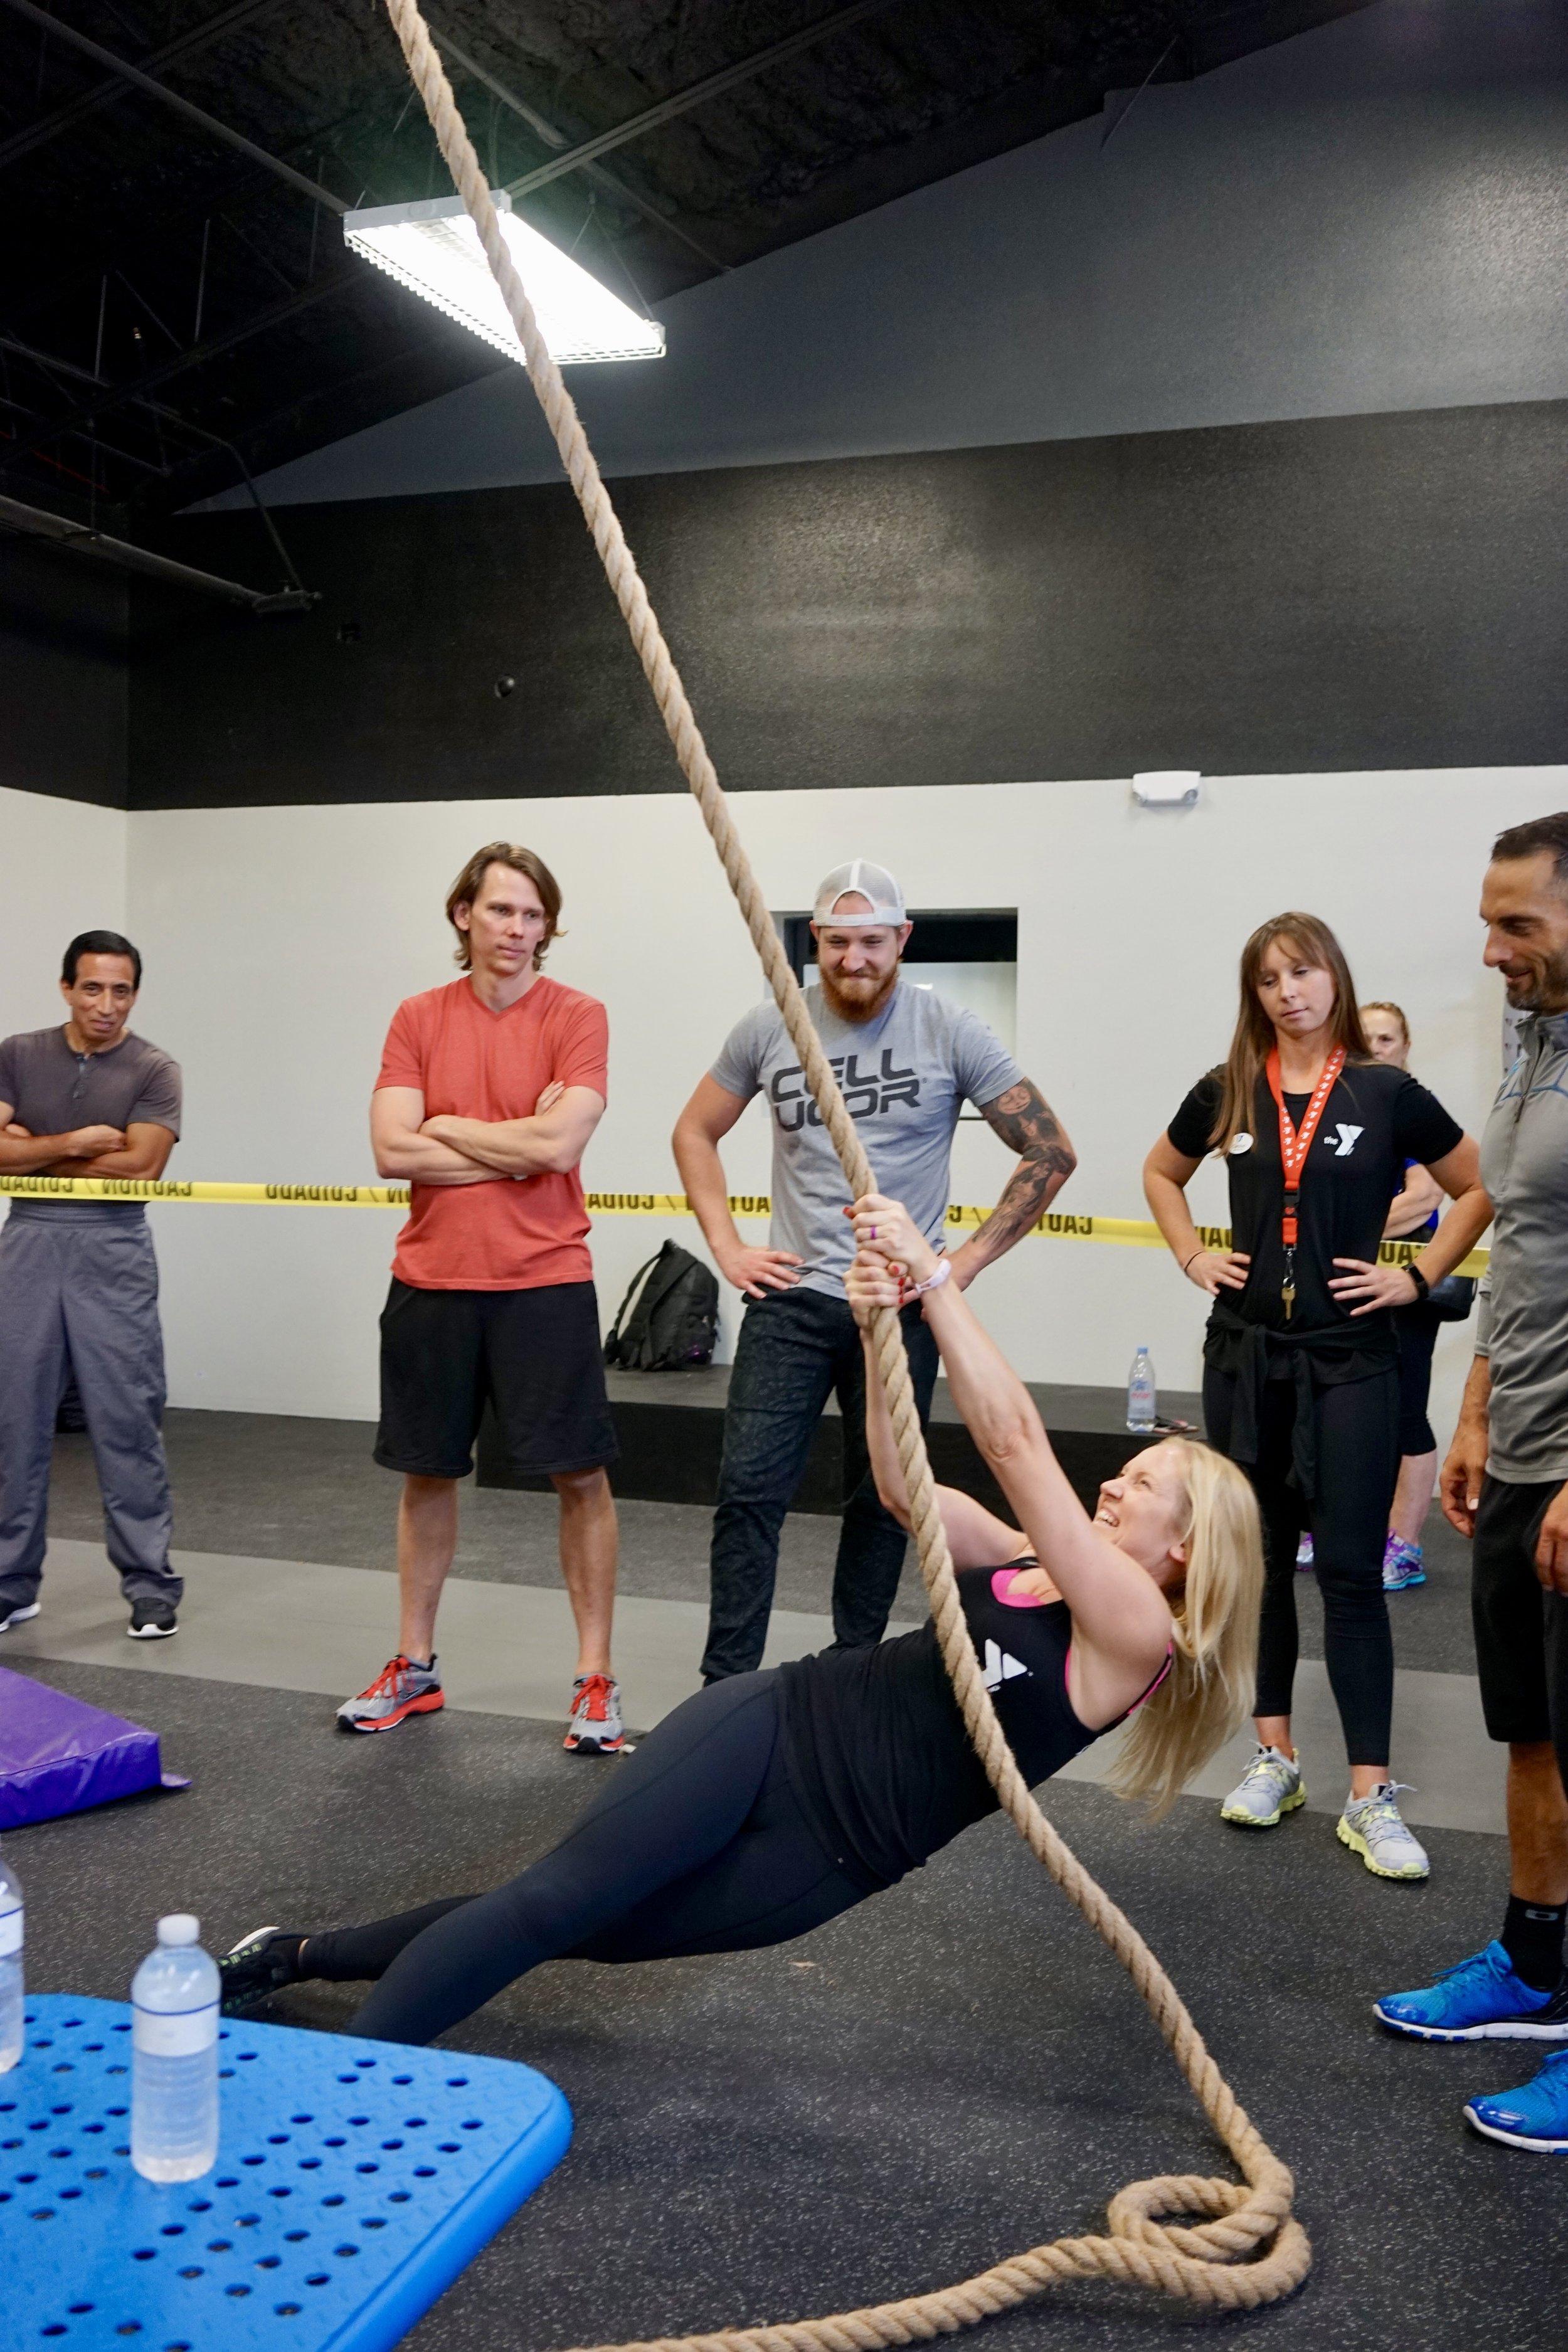 Climbing rope rotational pulls